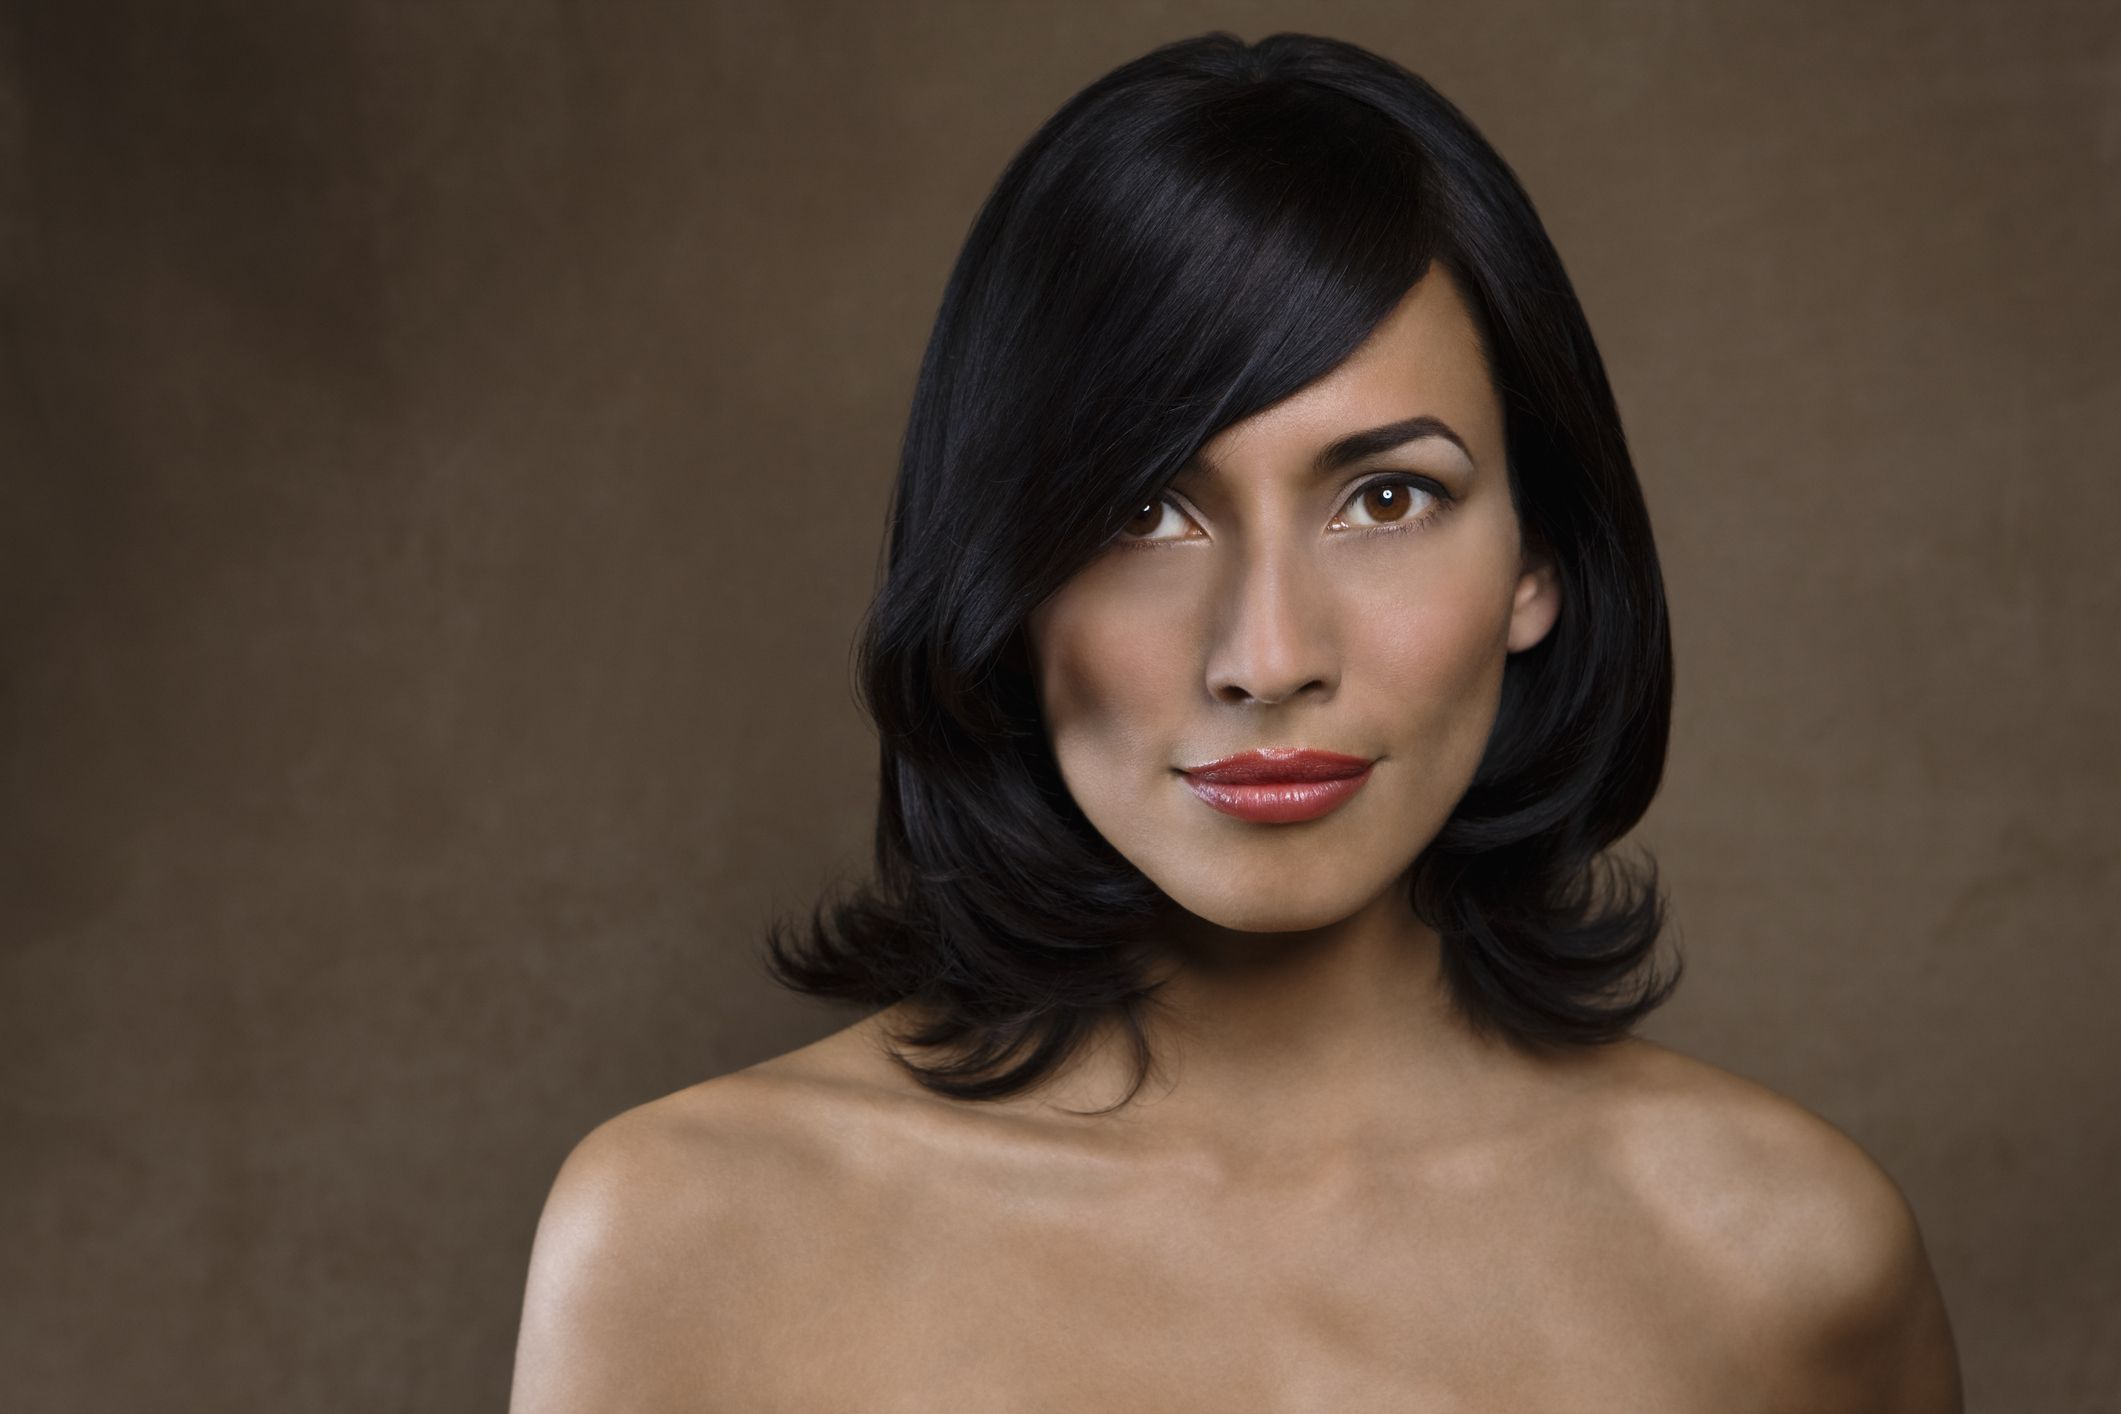 How To Nail The Medium-Length Hair Trend